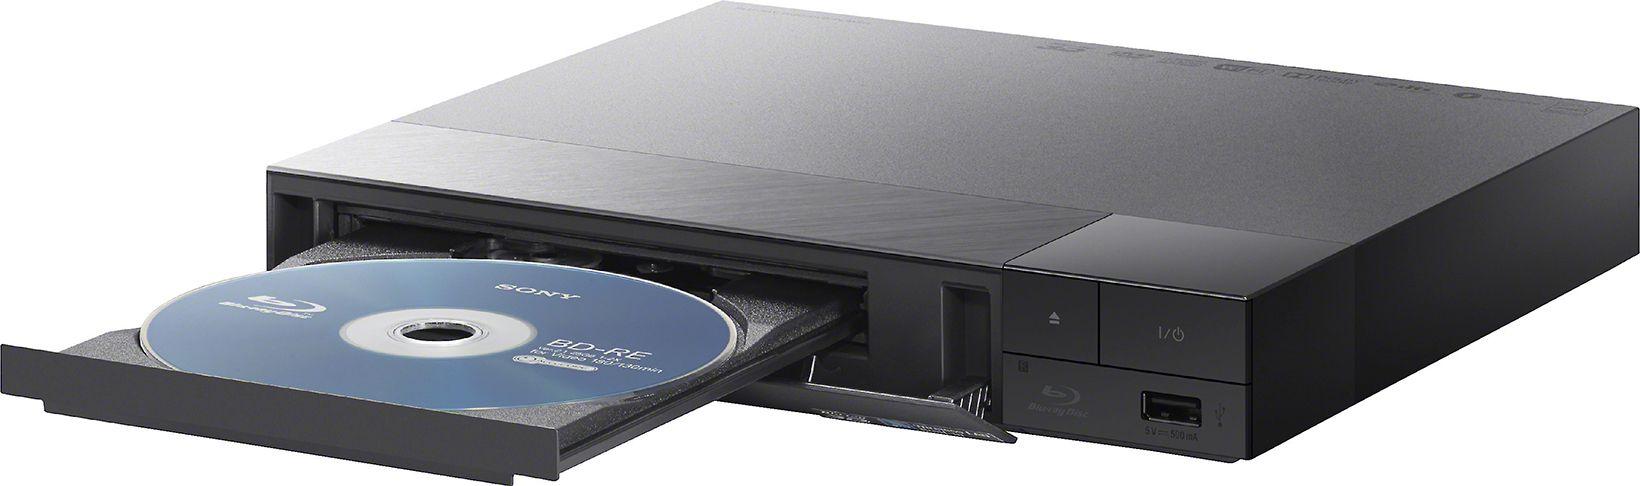 c657477f4746bf6afd77e450bde65233 - How To Get A Blu Ray Disc To Play